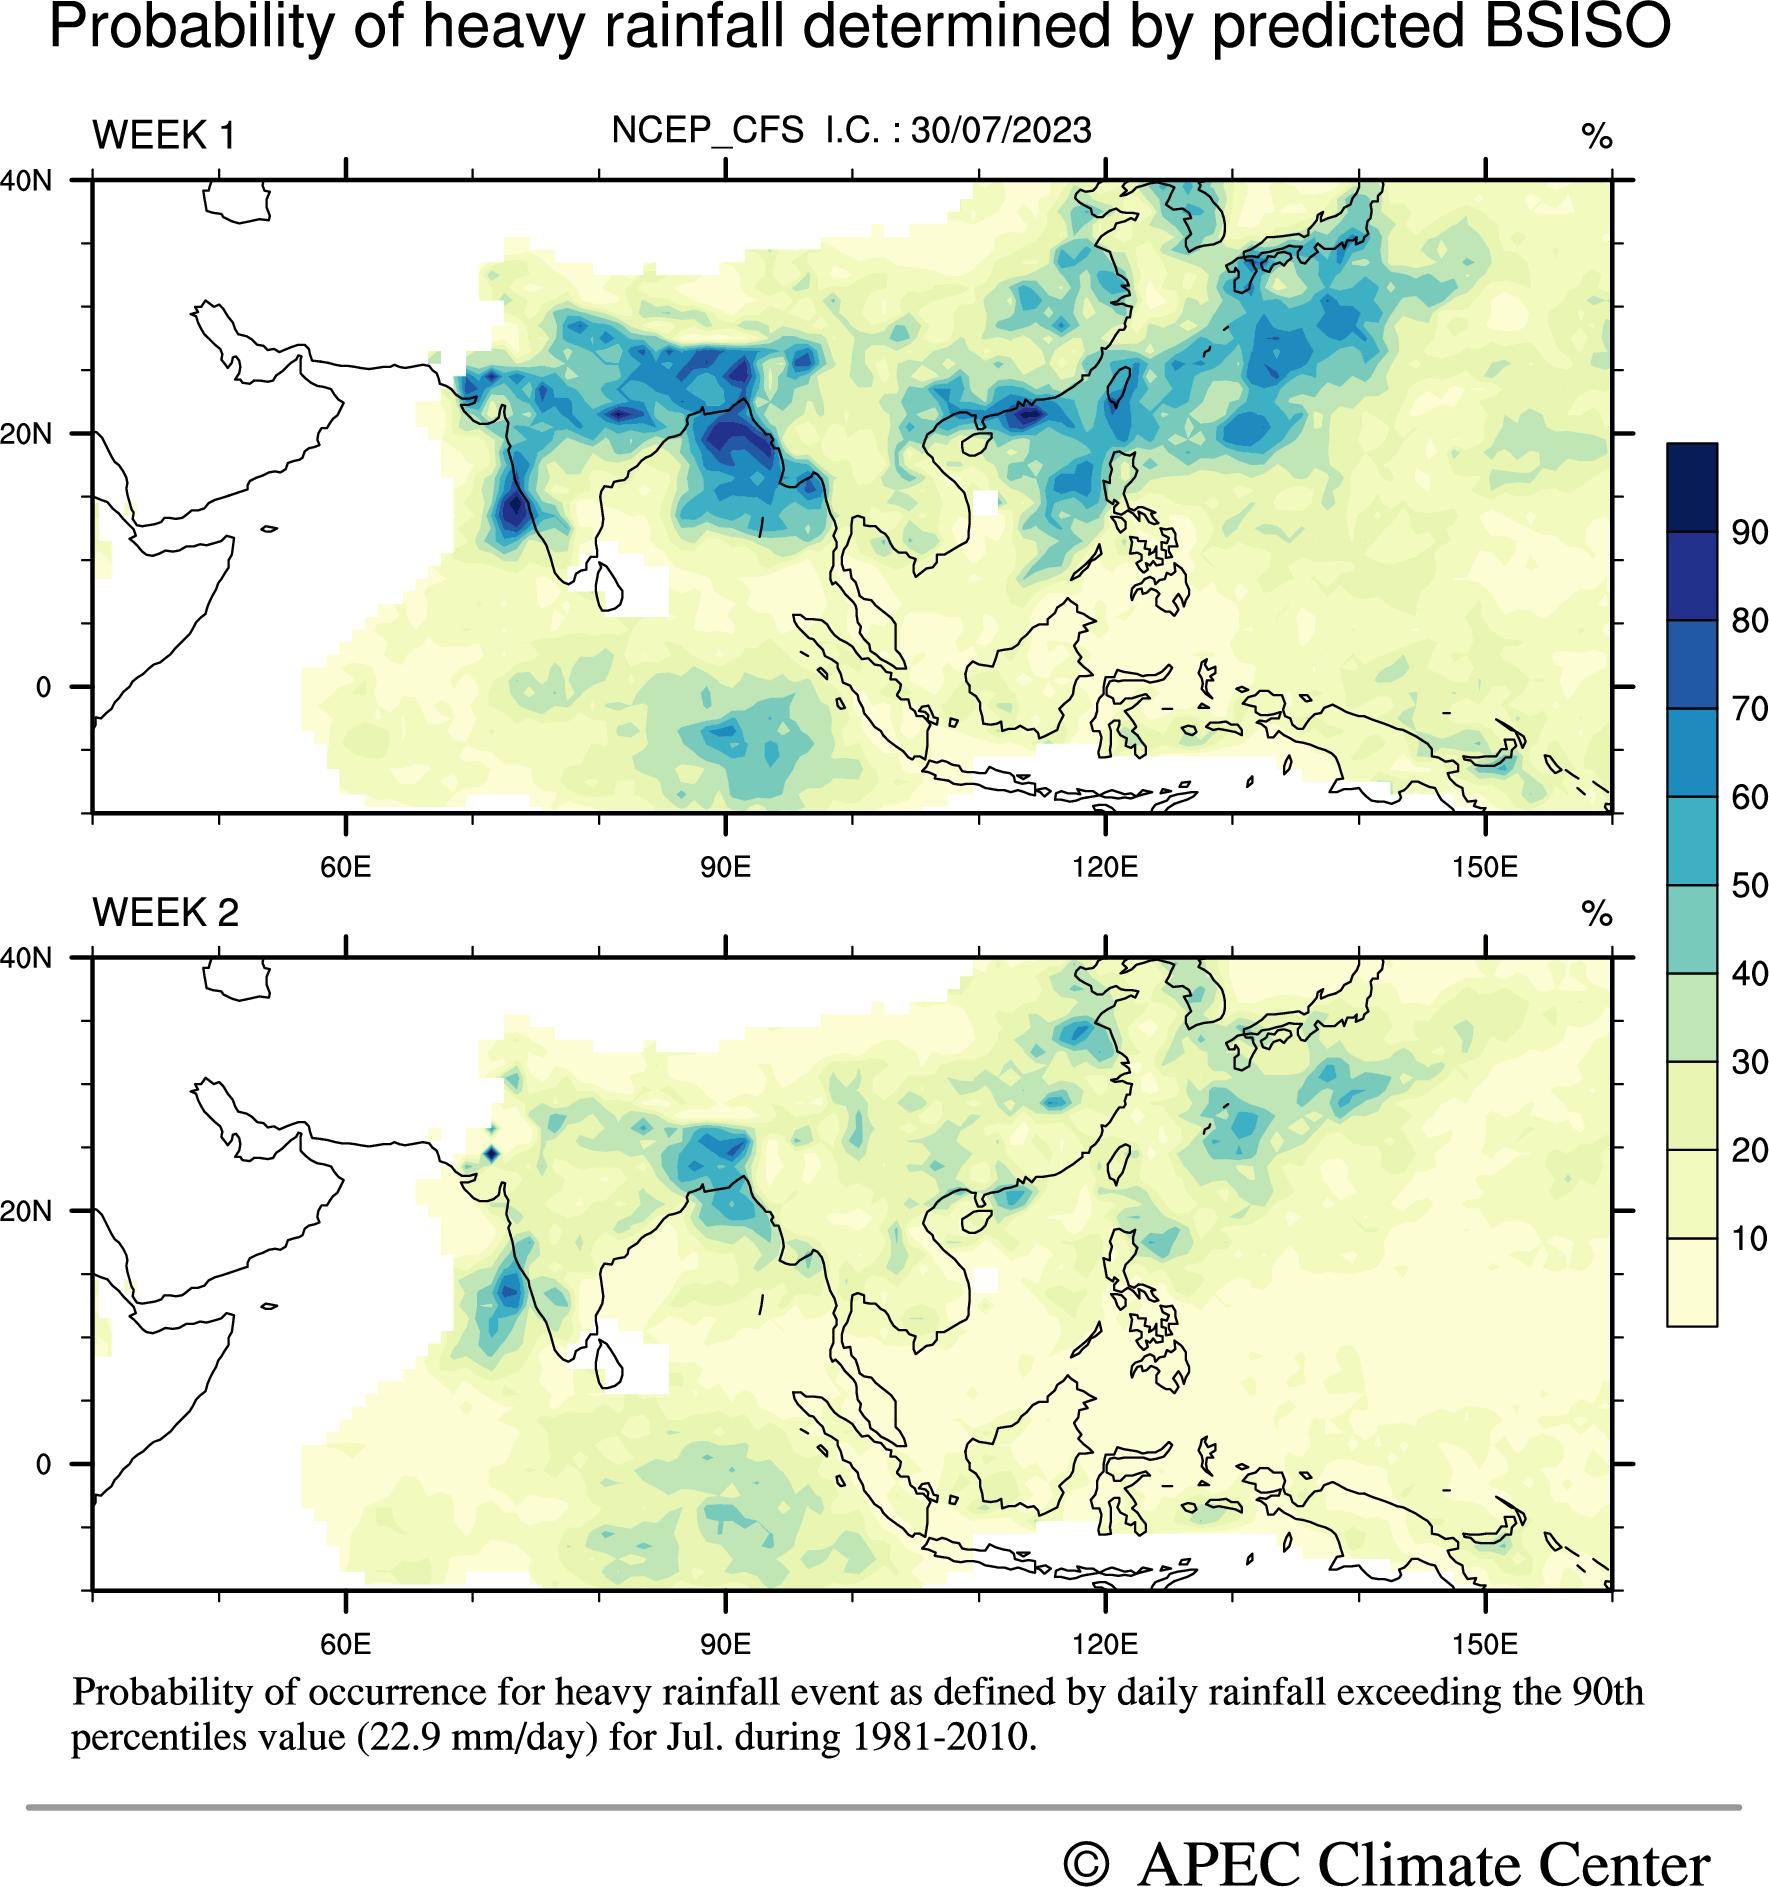 MISO heavy rainfall probability Forecast, CFSv2